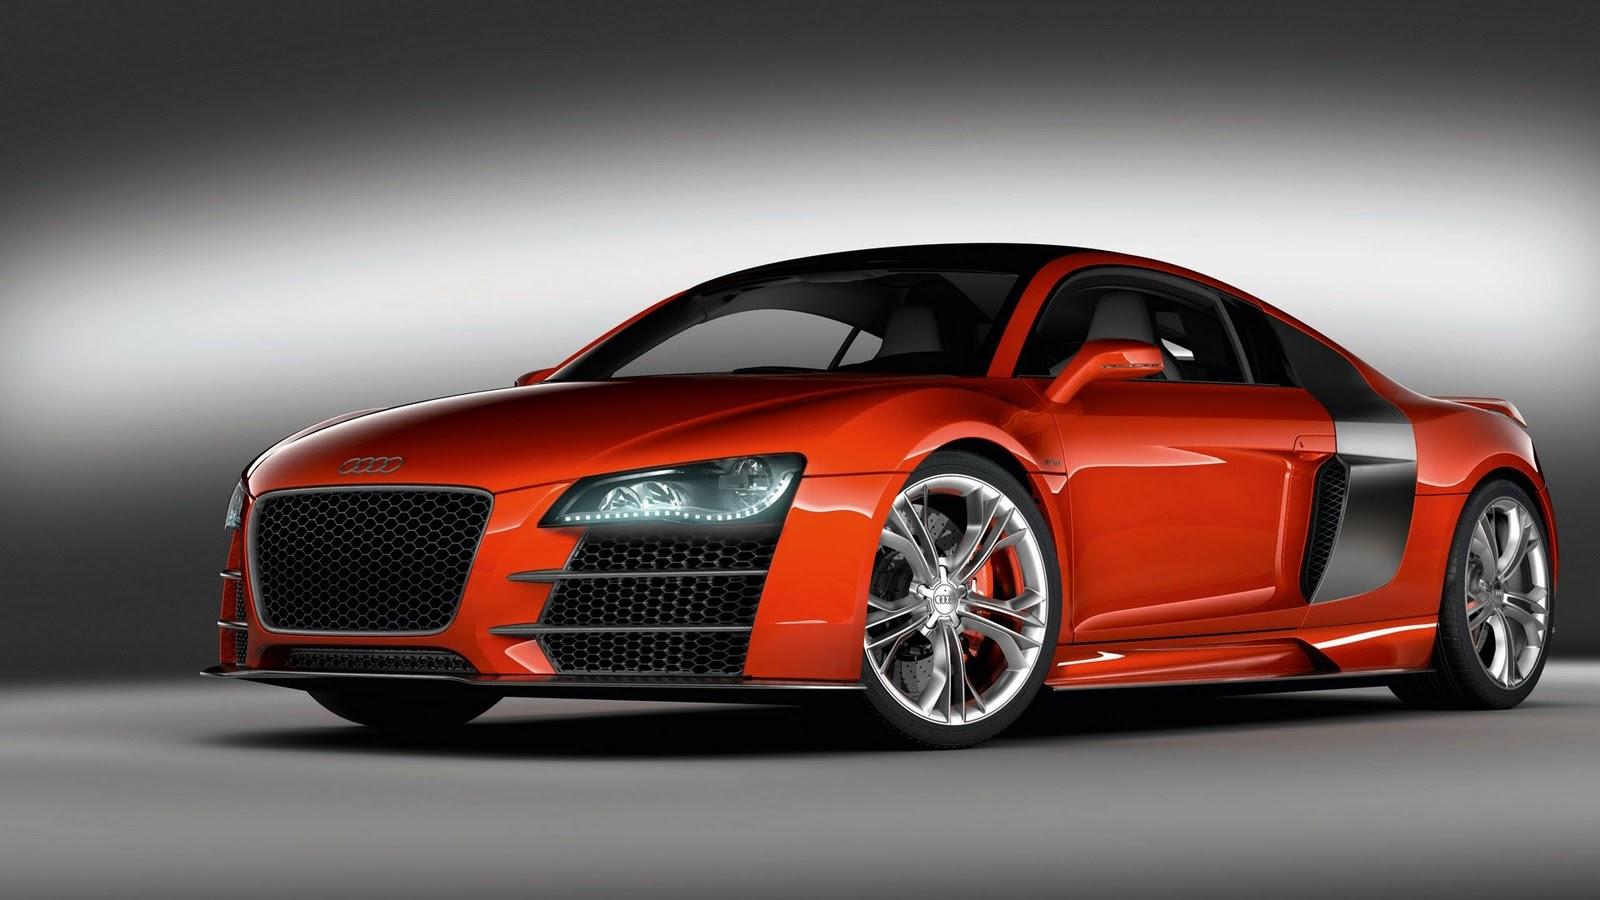 Hd car wallpapers 1080p classic cars - Car hd wallpapers 1080p download ...